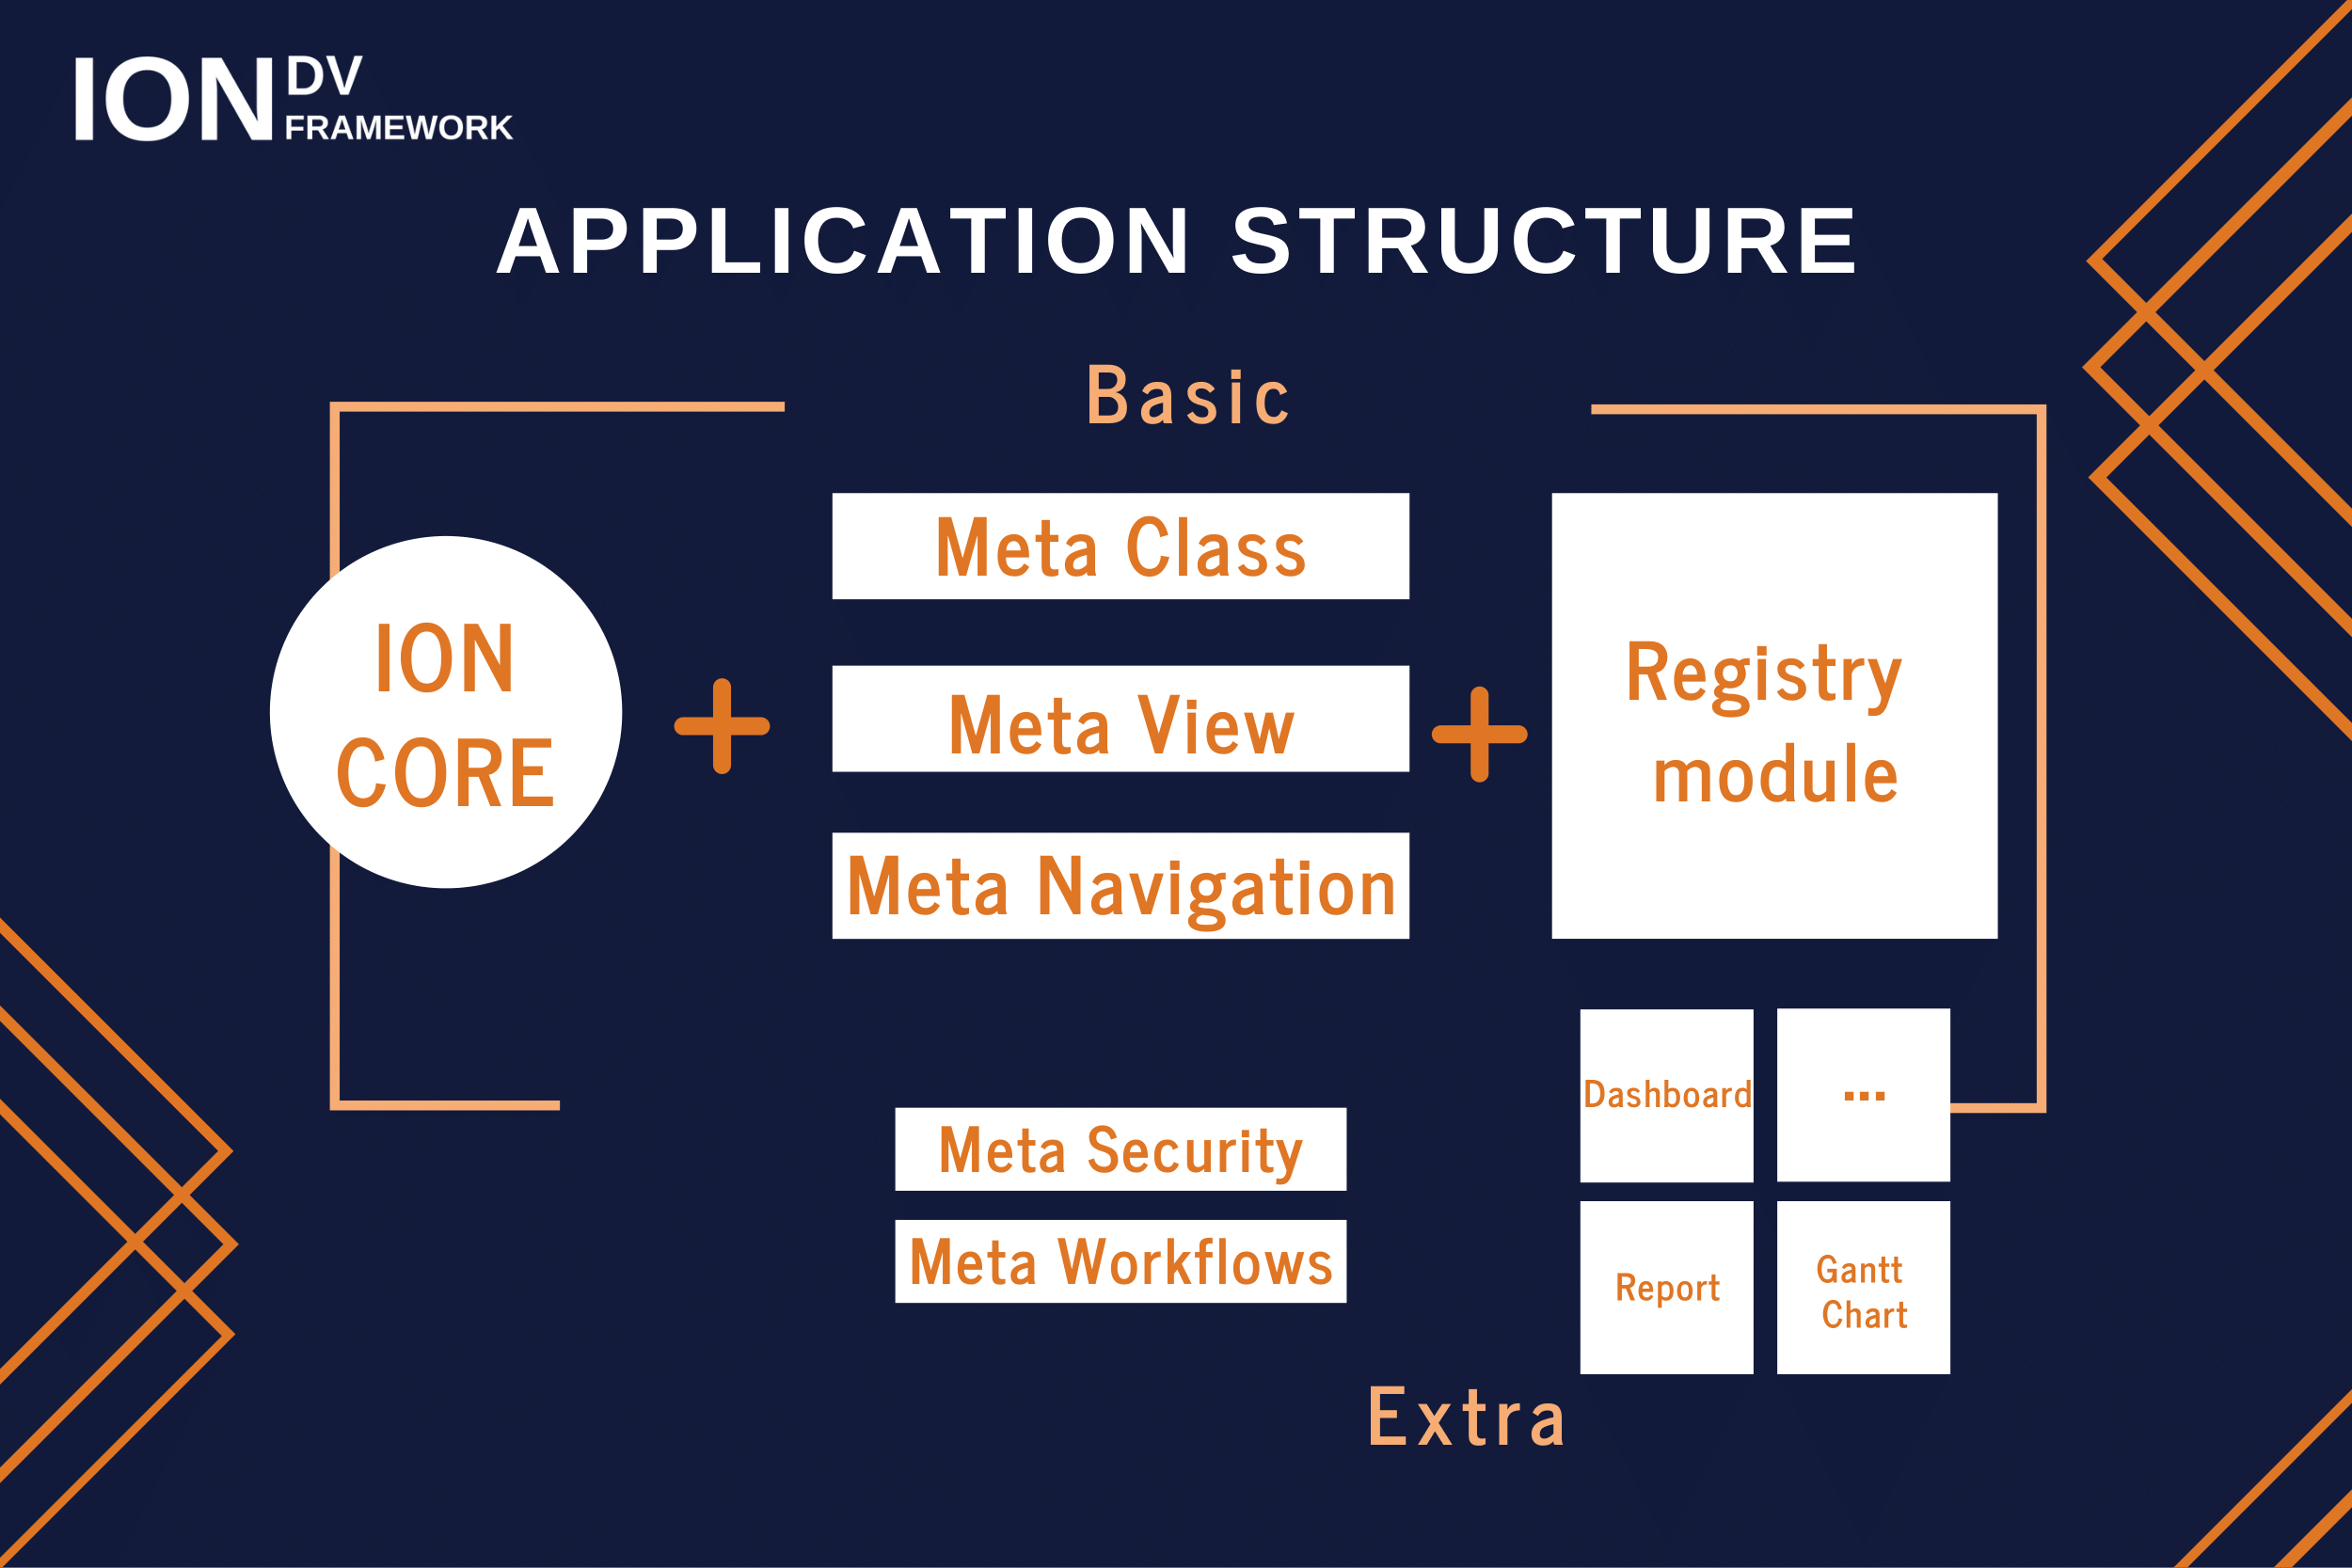 Application structure - core, metadata, modules